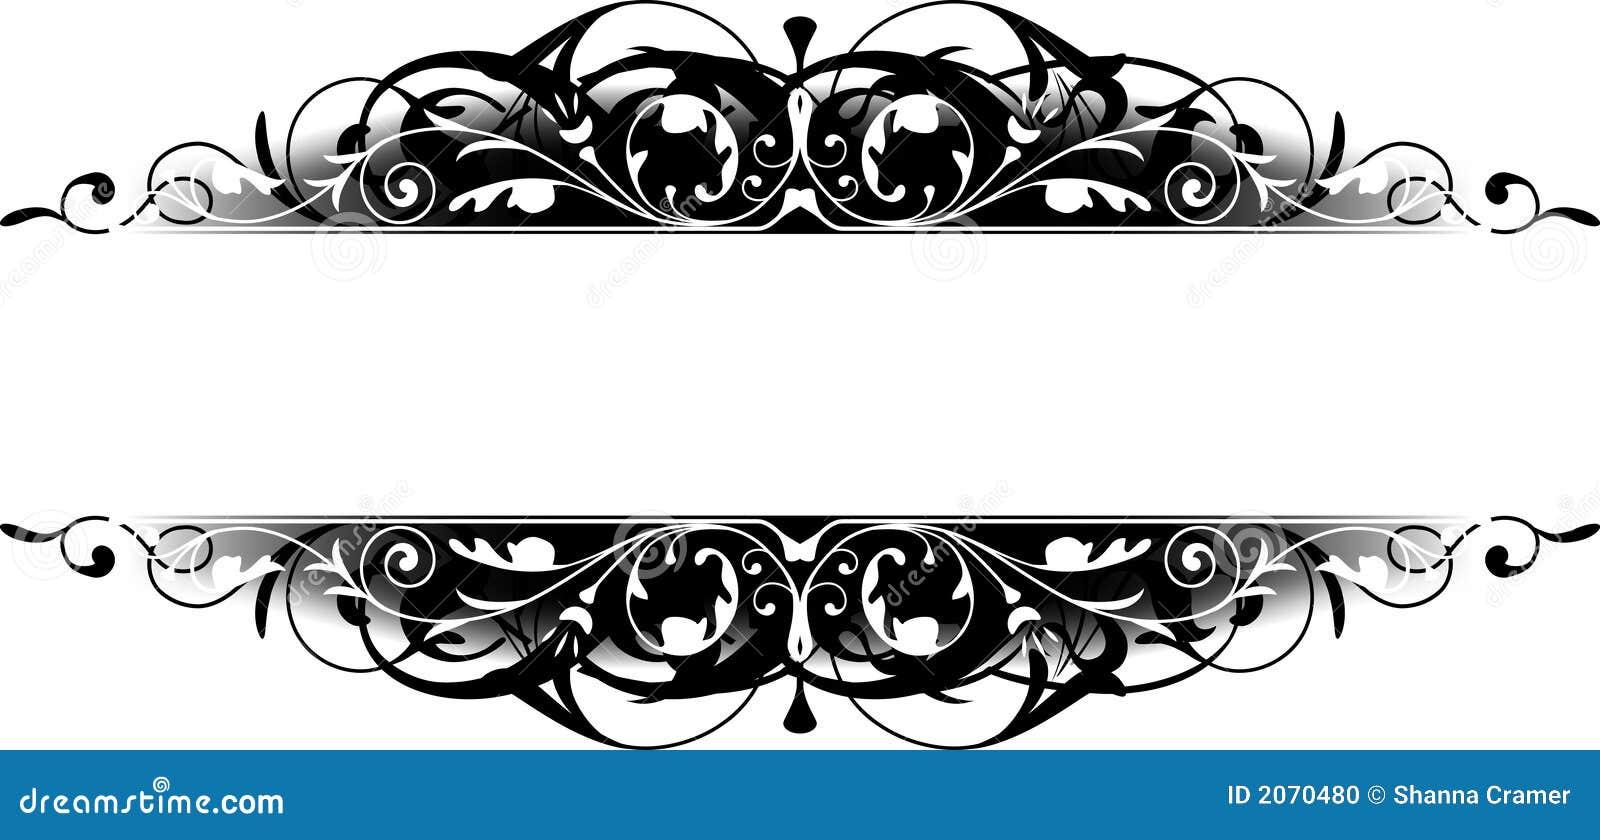 Scroll Border Clip Art scroll stock illustrations, vectors, & clipart ...